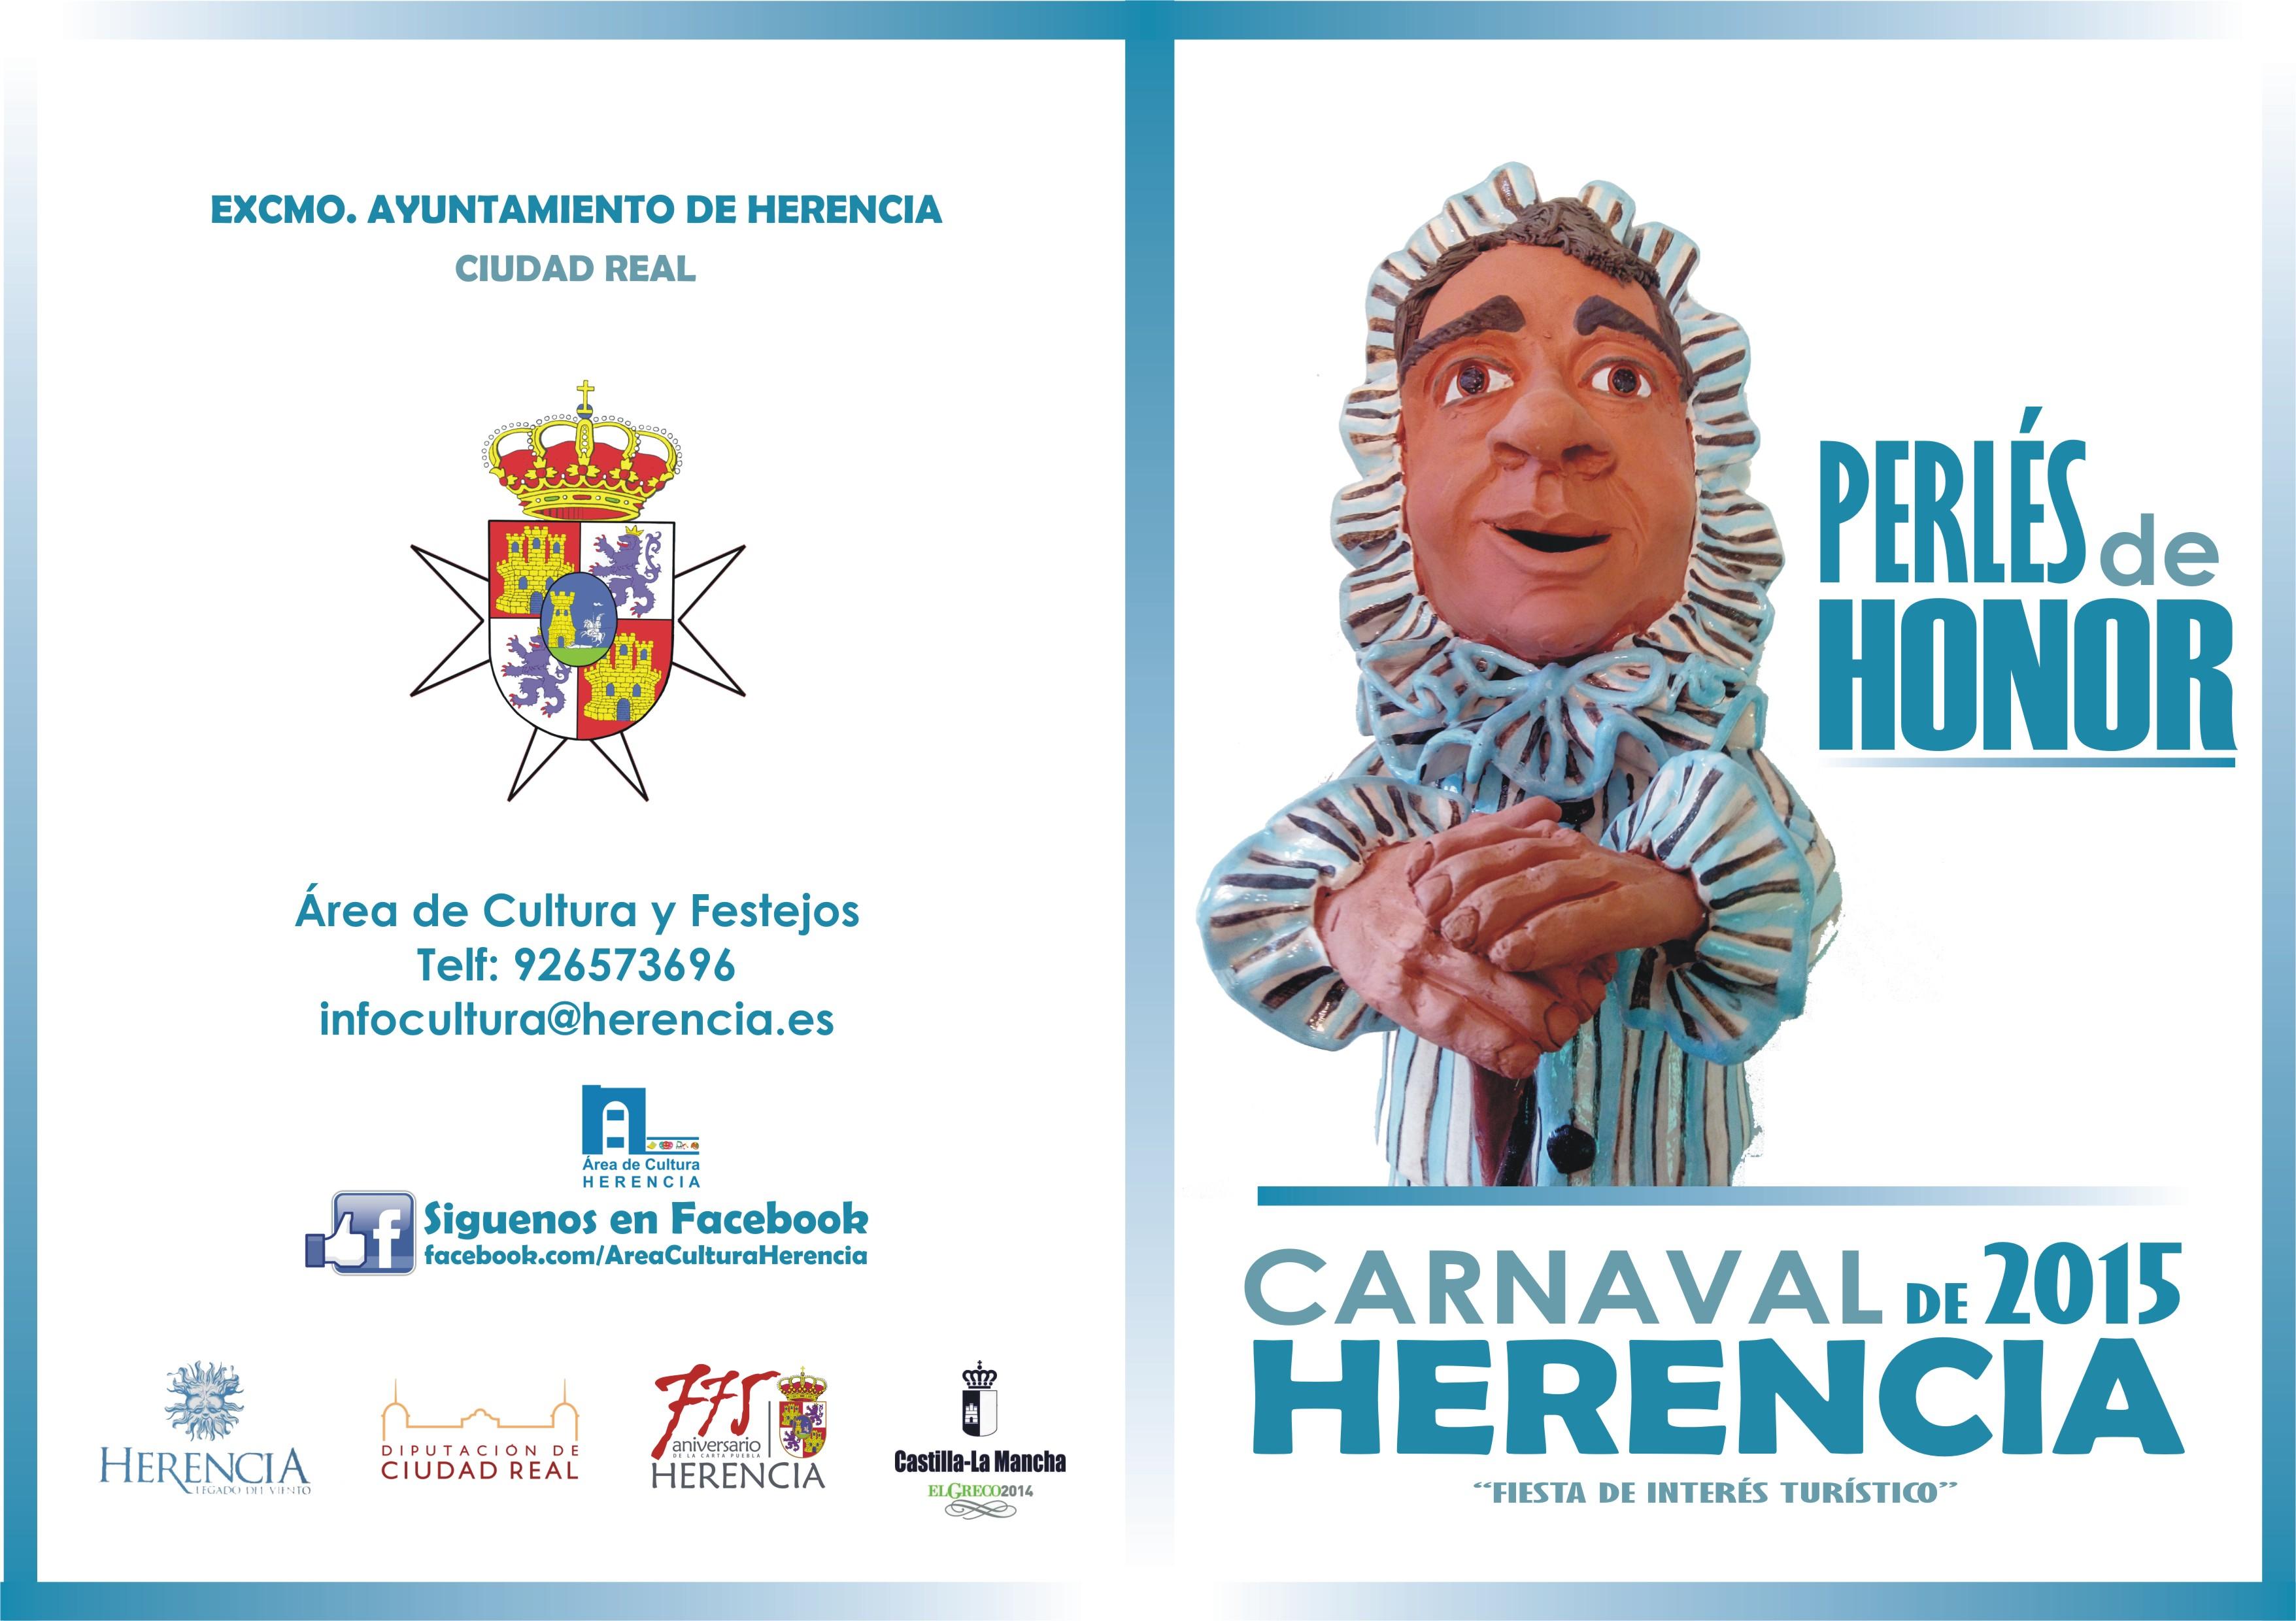 perles-de-honor-carnaval-de-herencia-2015